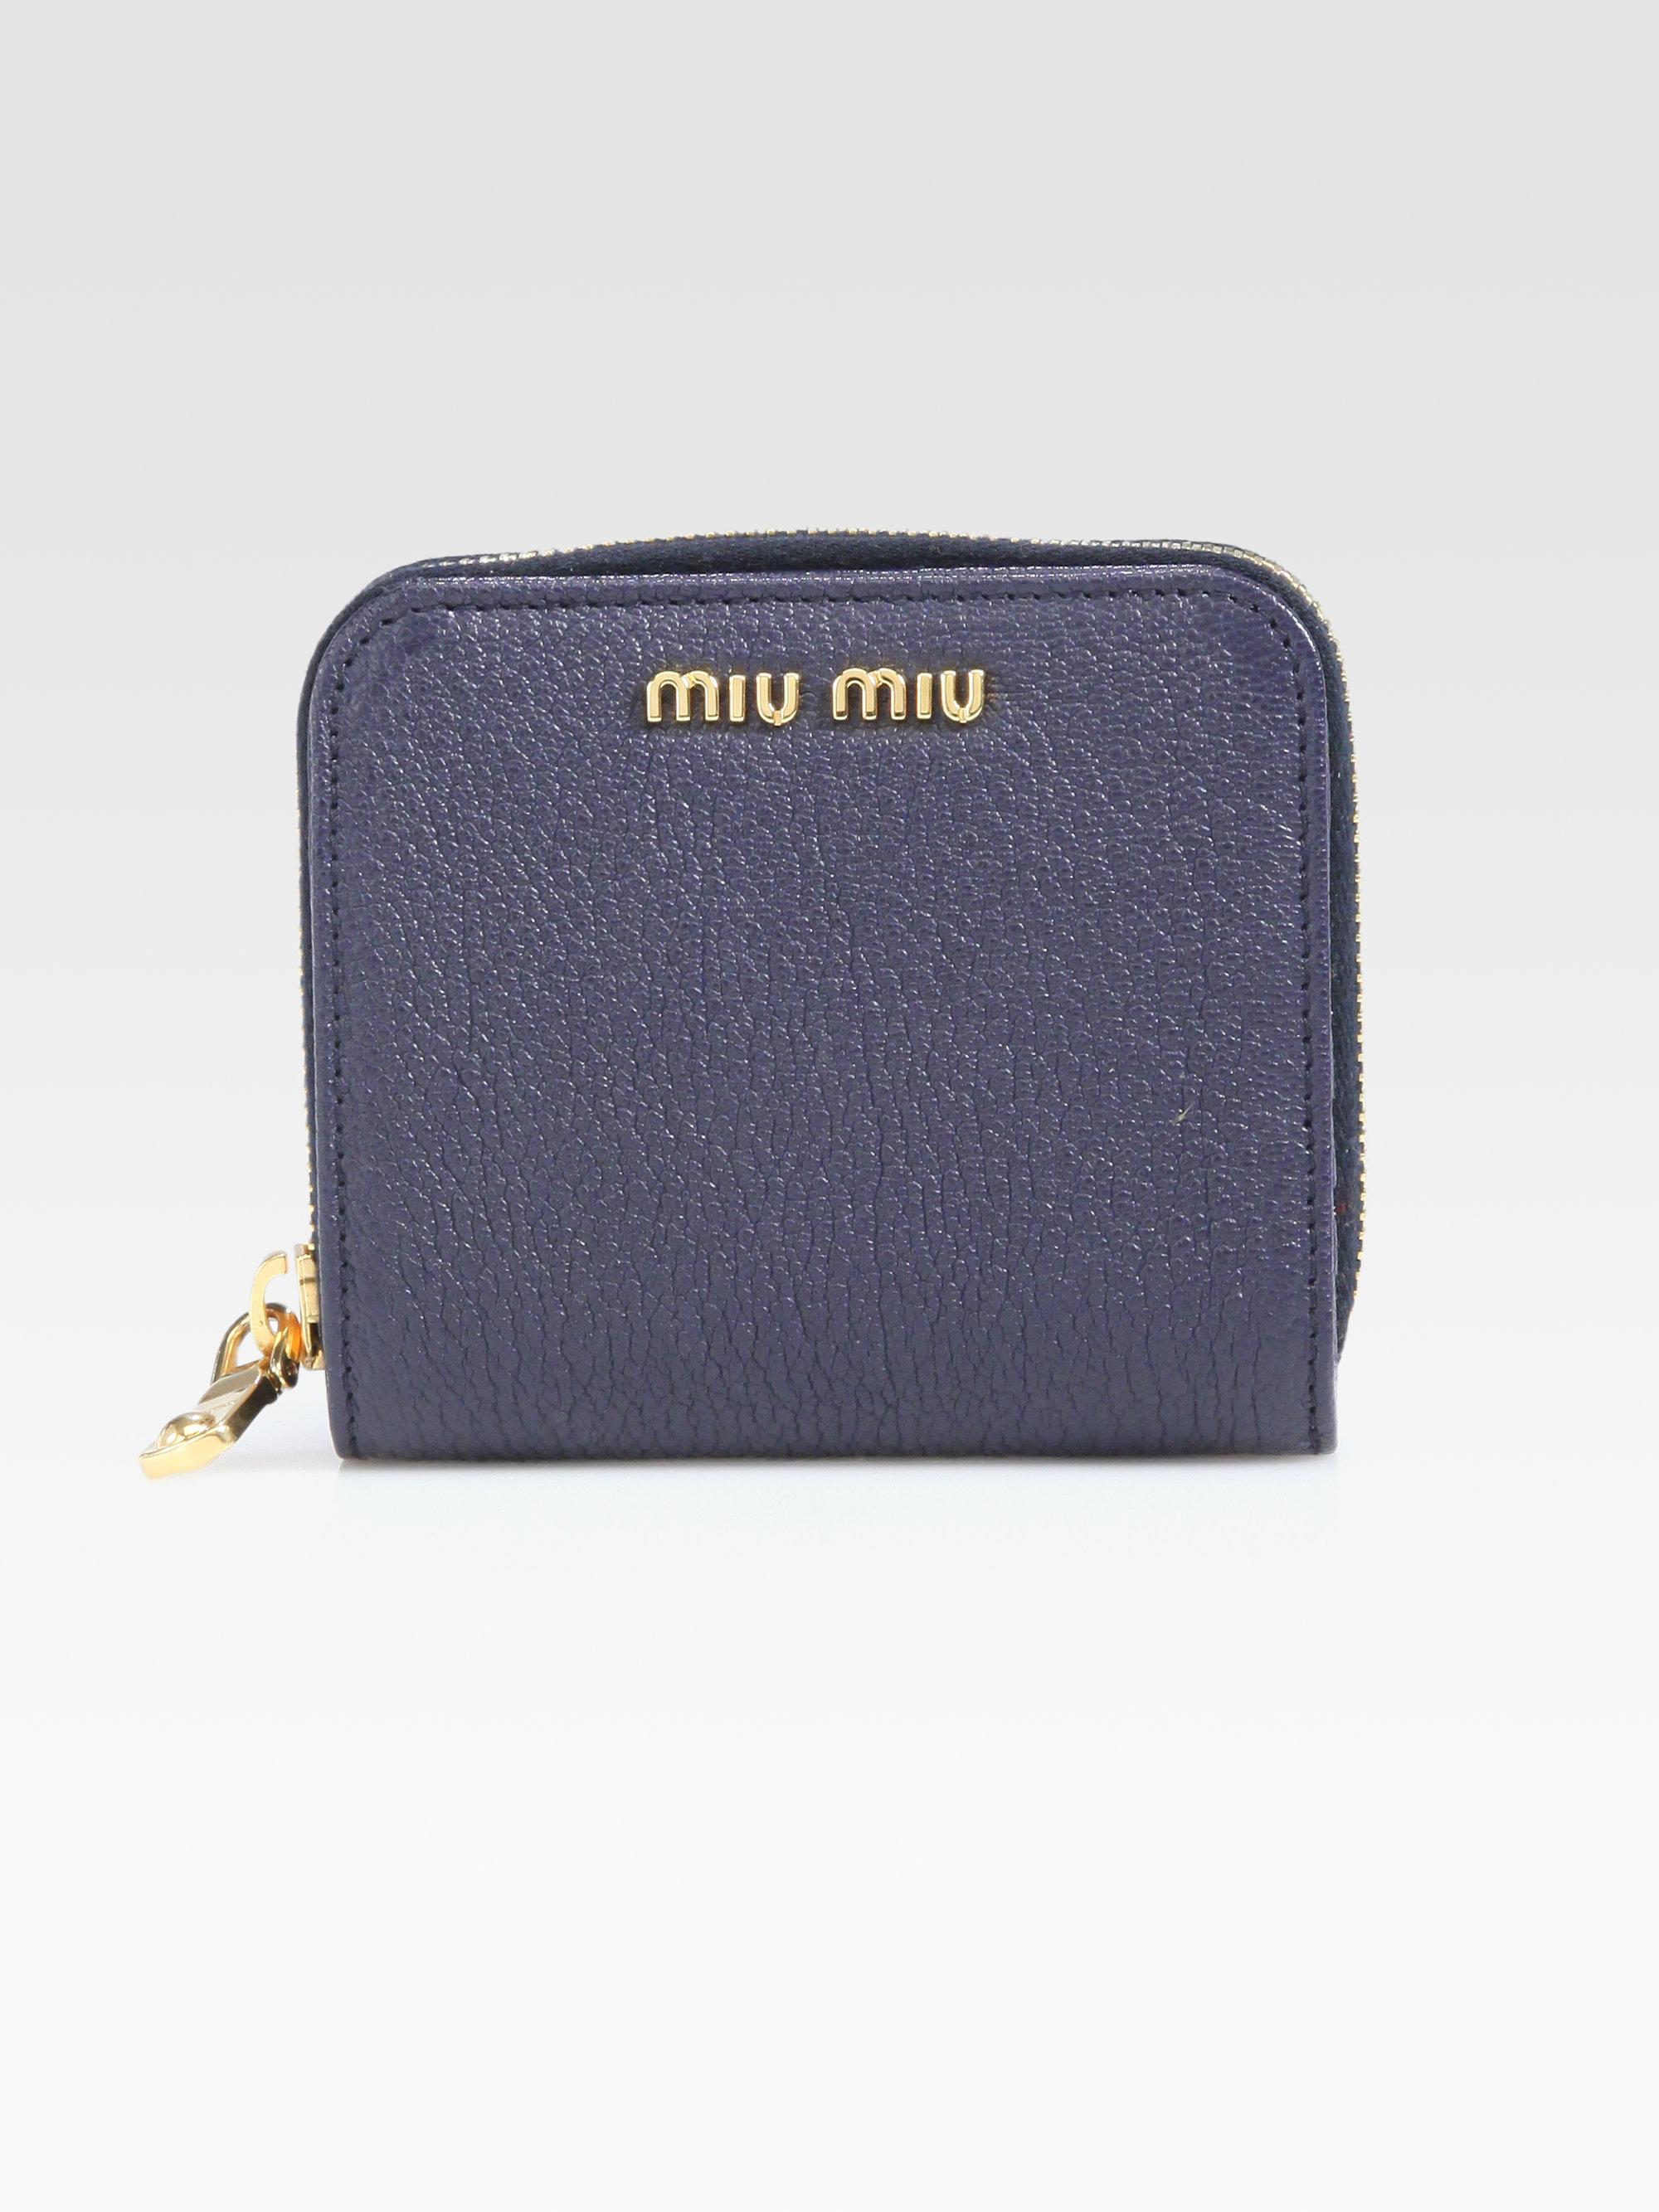 707d2be4c2f Lyst - Miu Miu Madras Ziparound Leather Wallet in Blue